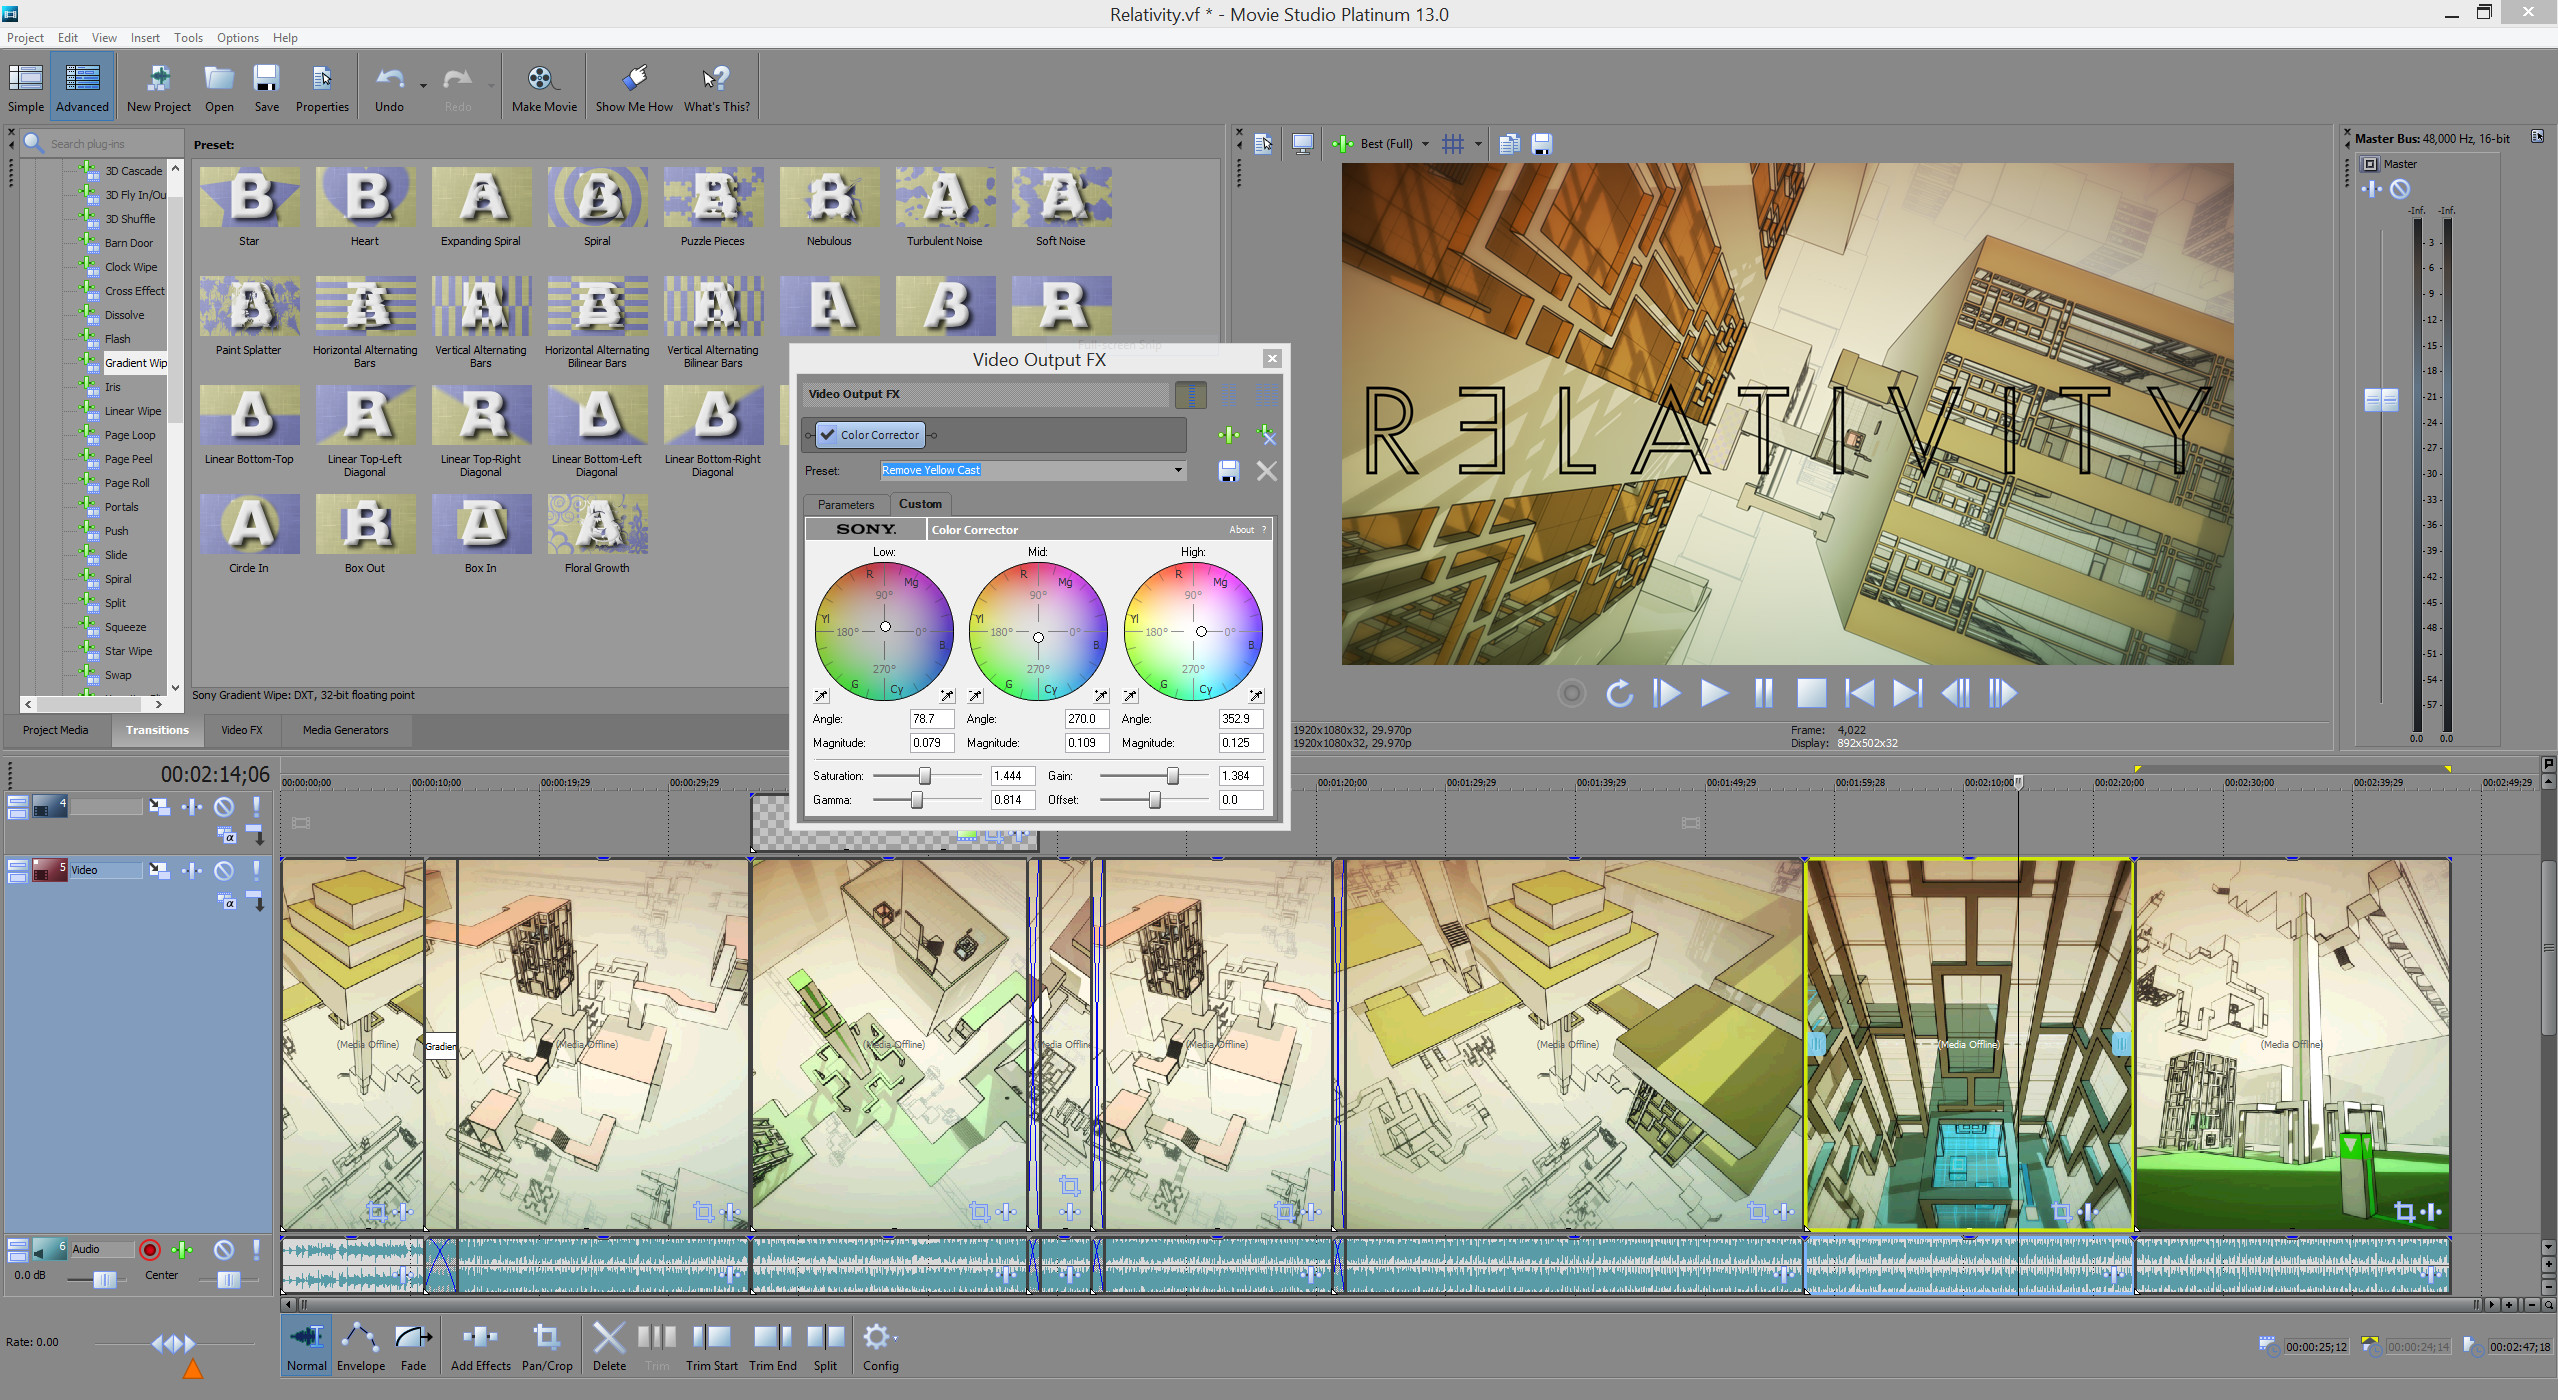 VEGAS Movie Studio 13 Platinum - Steam Powered screenshot